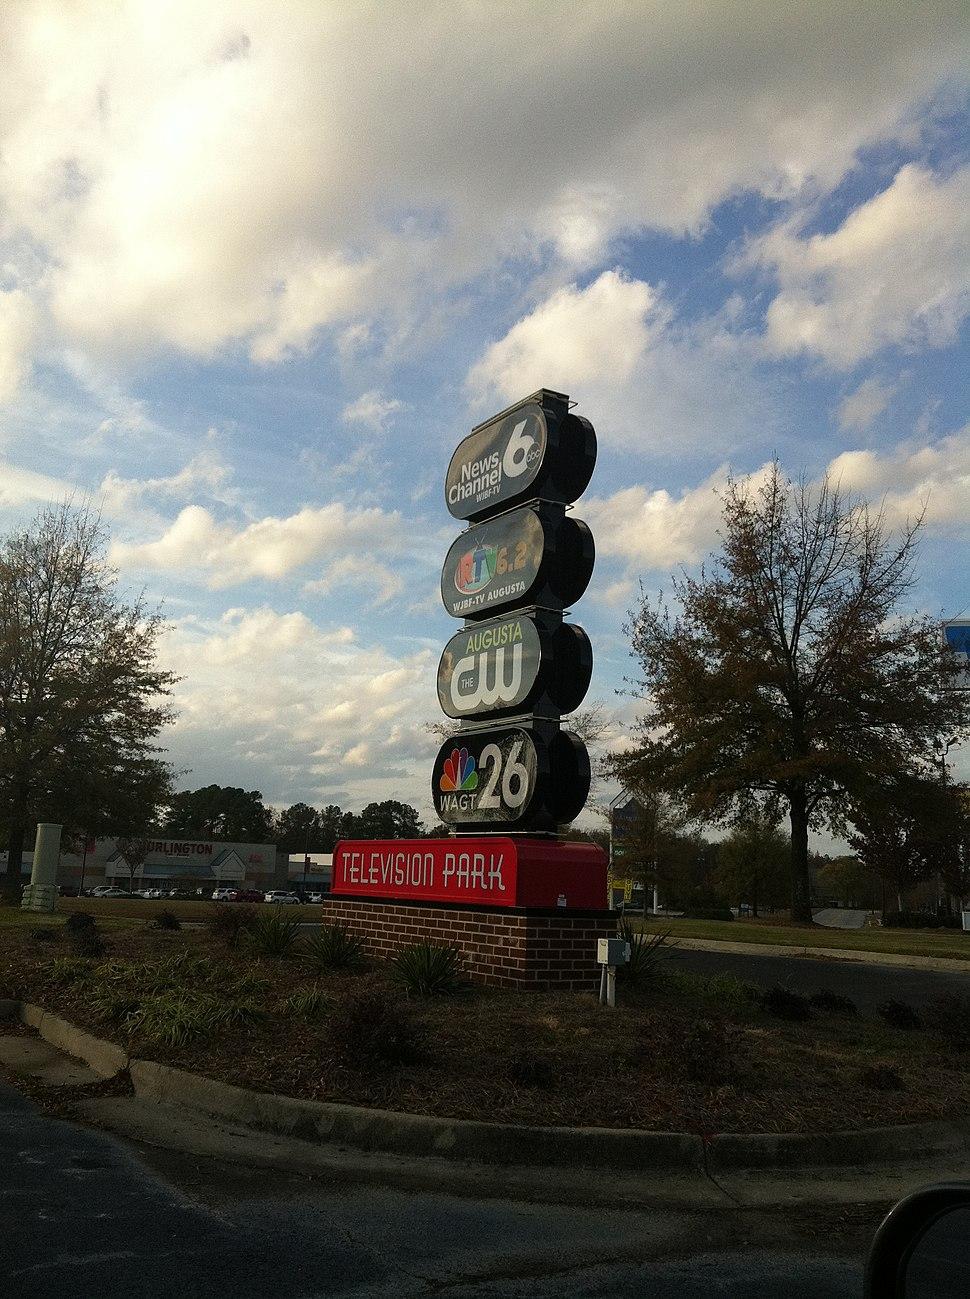 TV Networks in the former Barnes & Noble Augusta GA